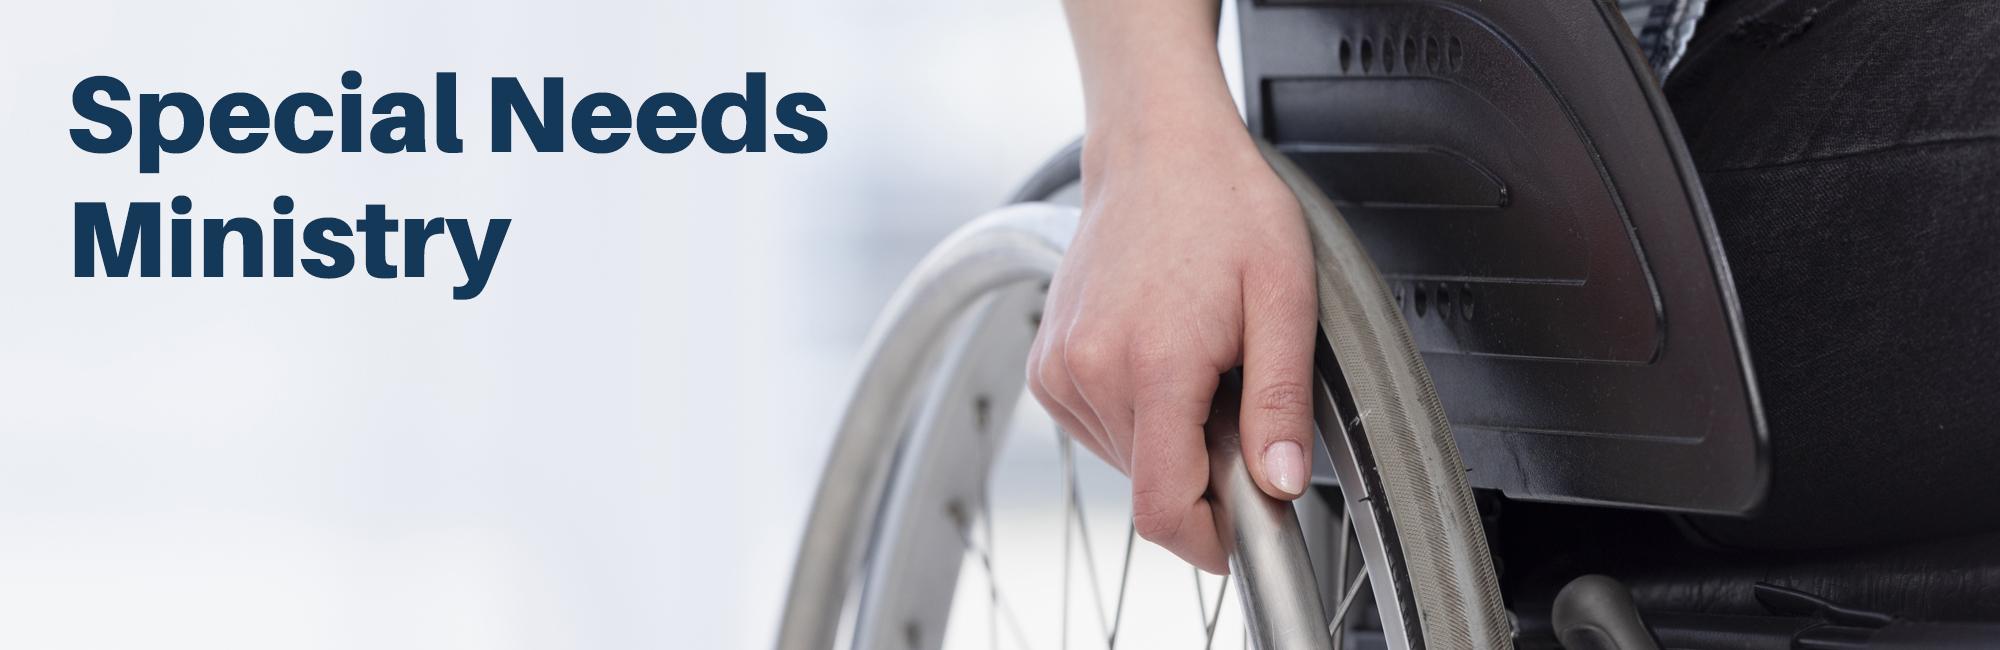 Special Needs - Web Header